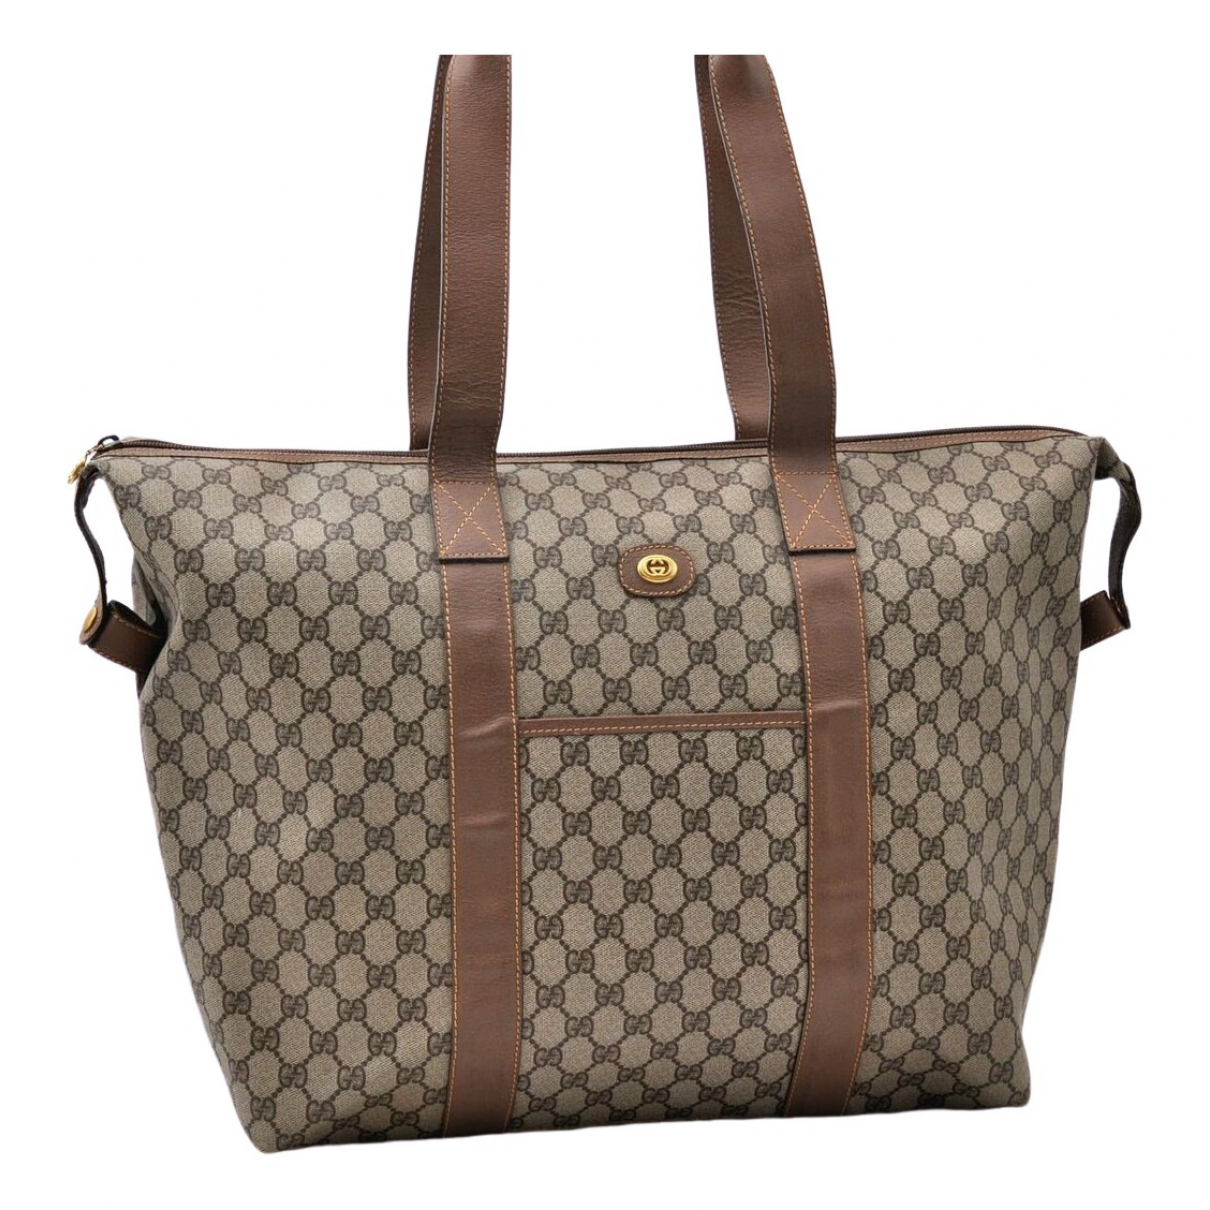 Gucci \N Brown Travel bag for Women \N